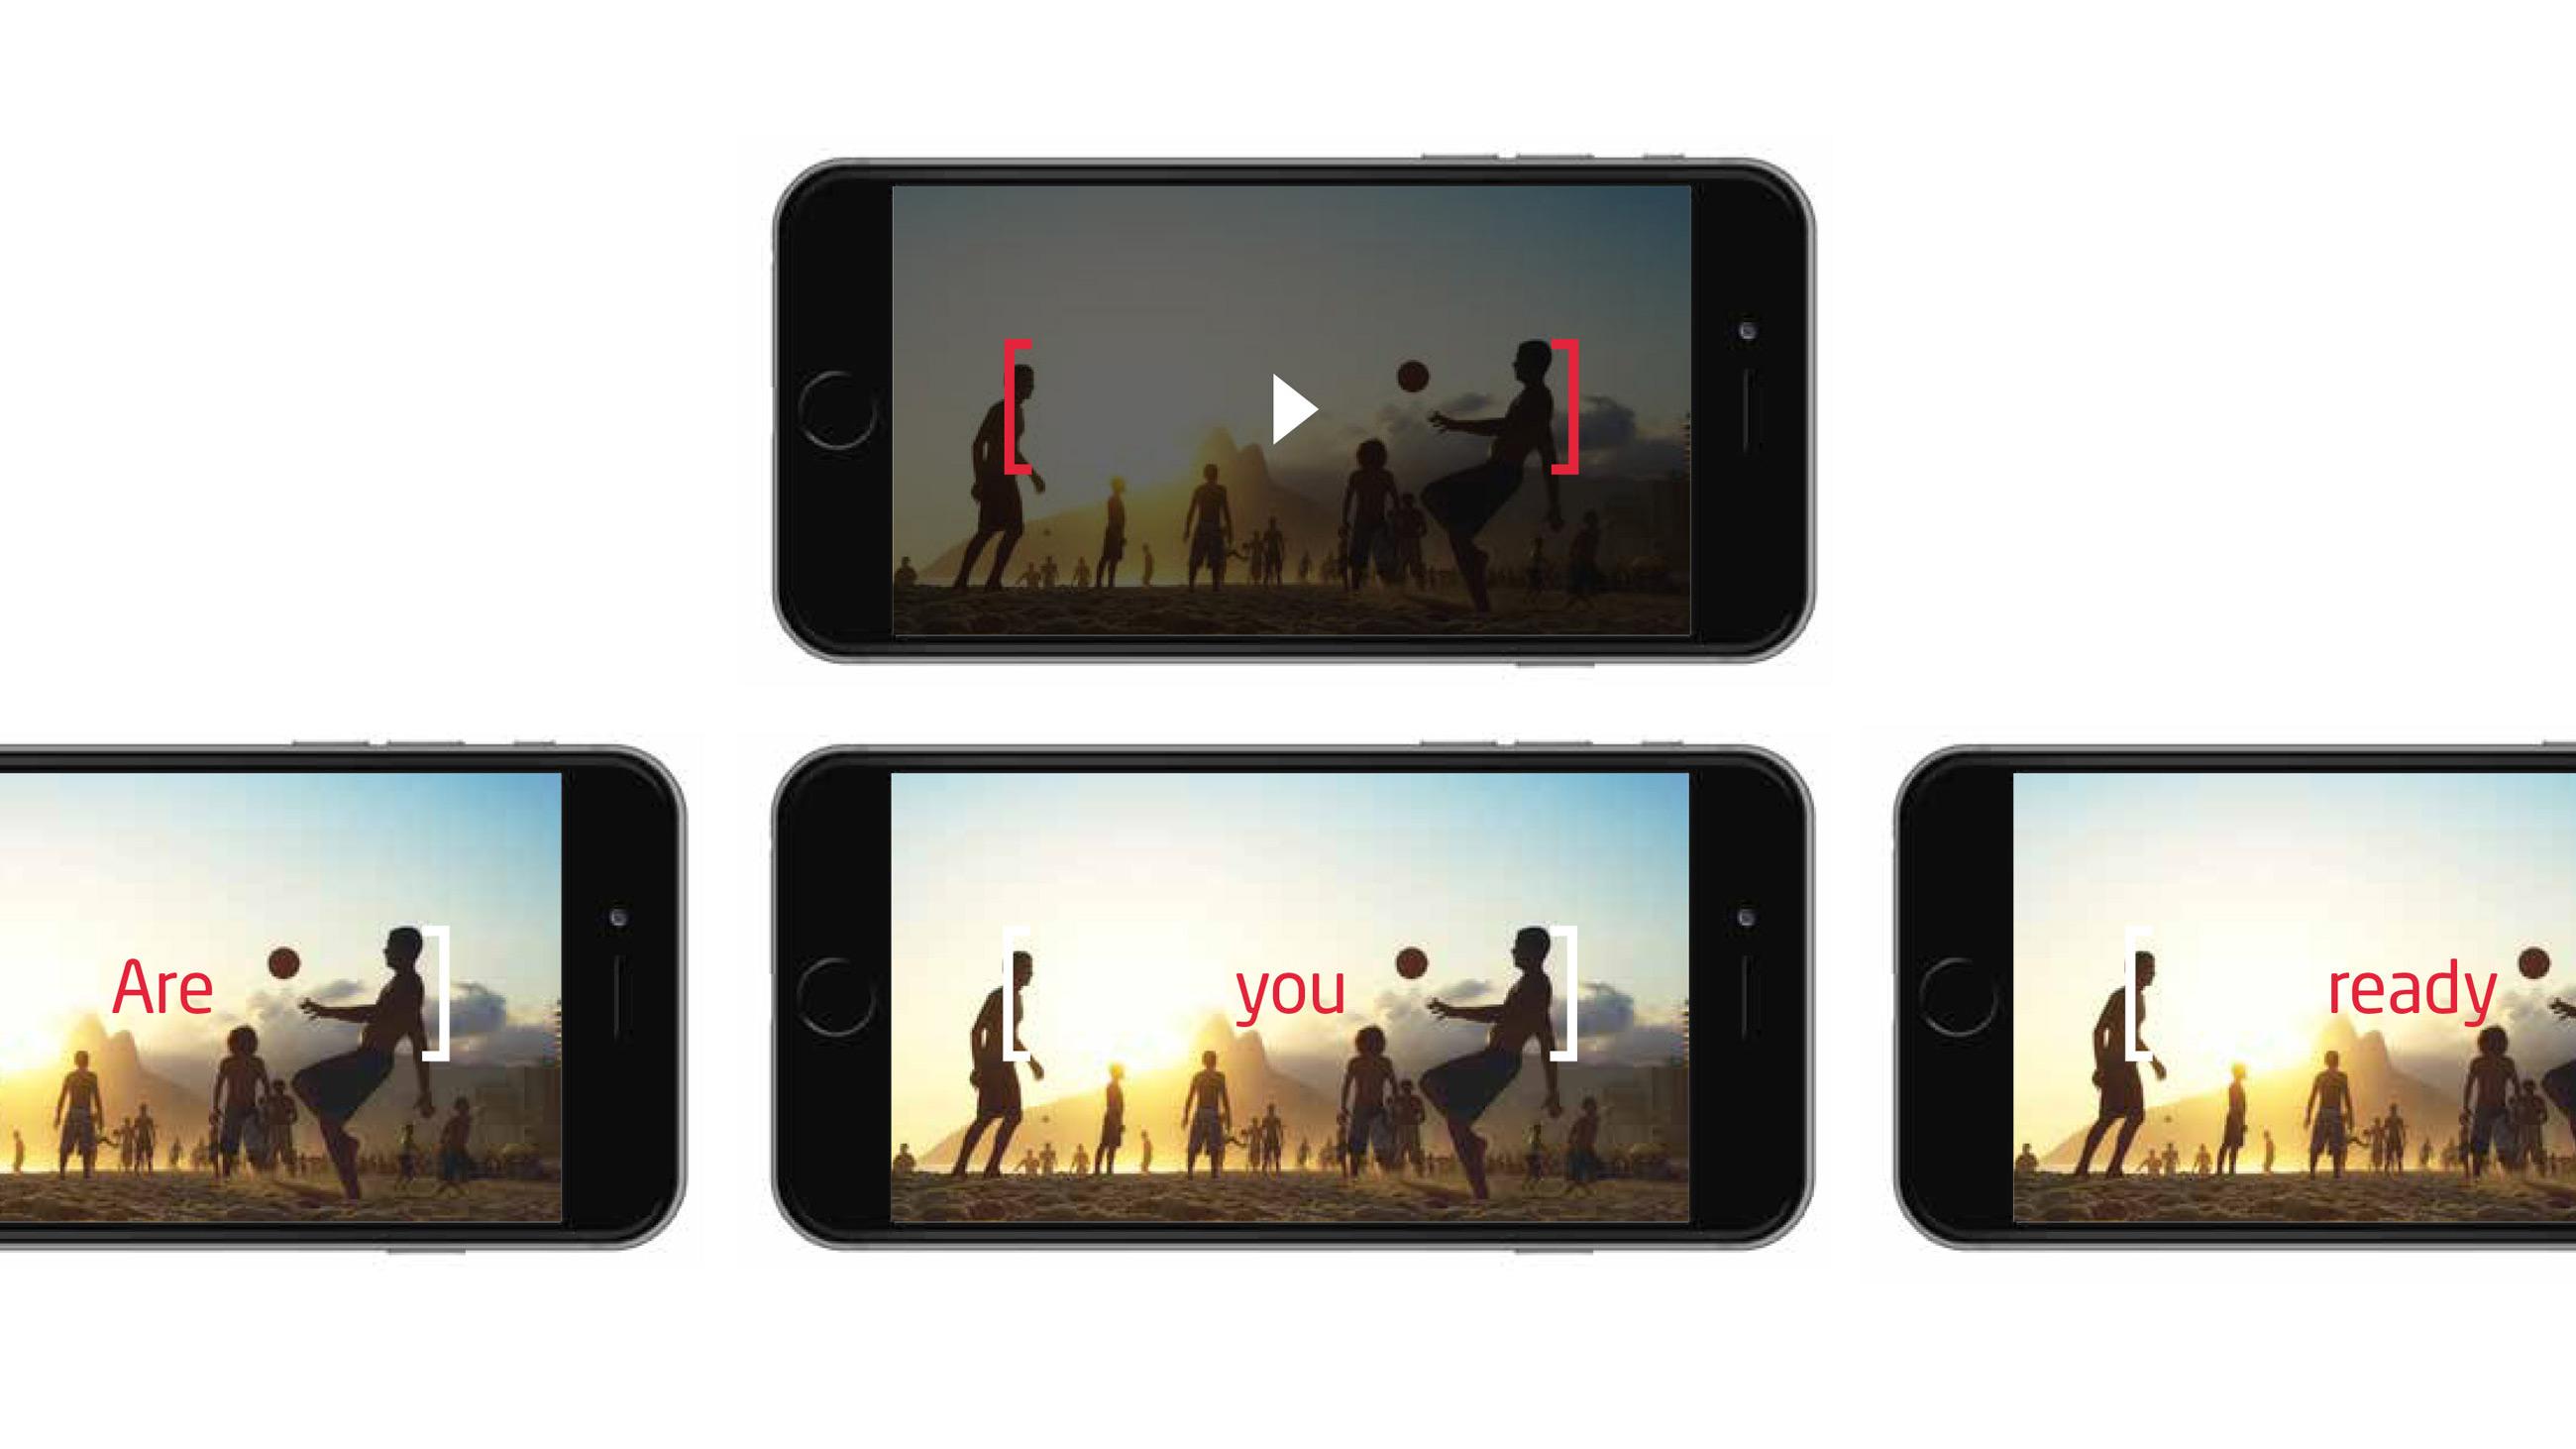 Brand iphone screens Arkadin